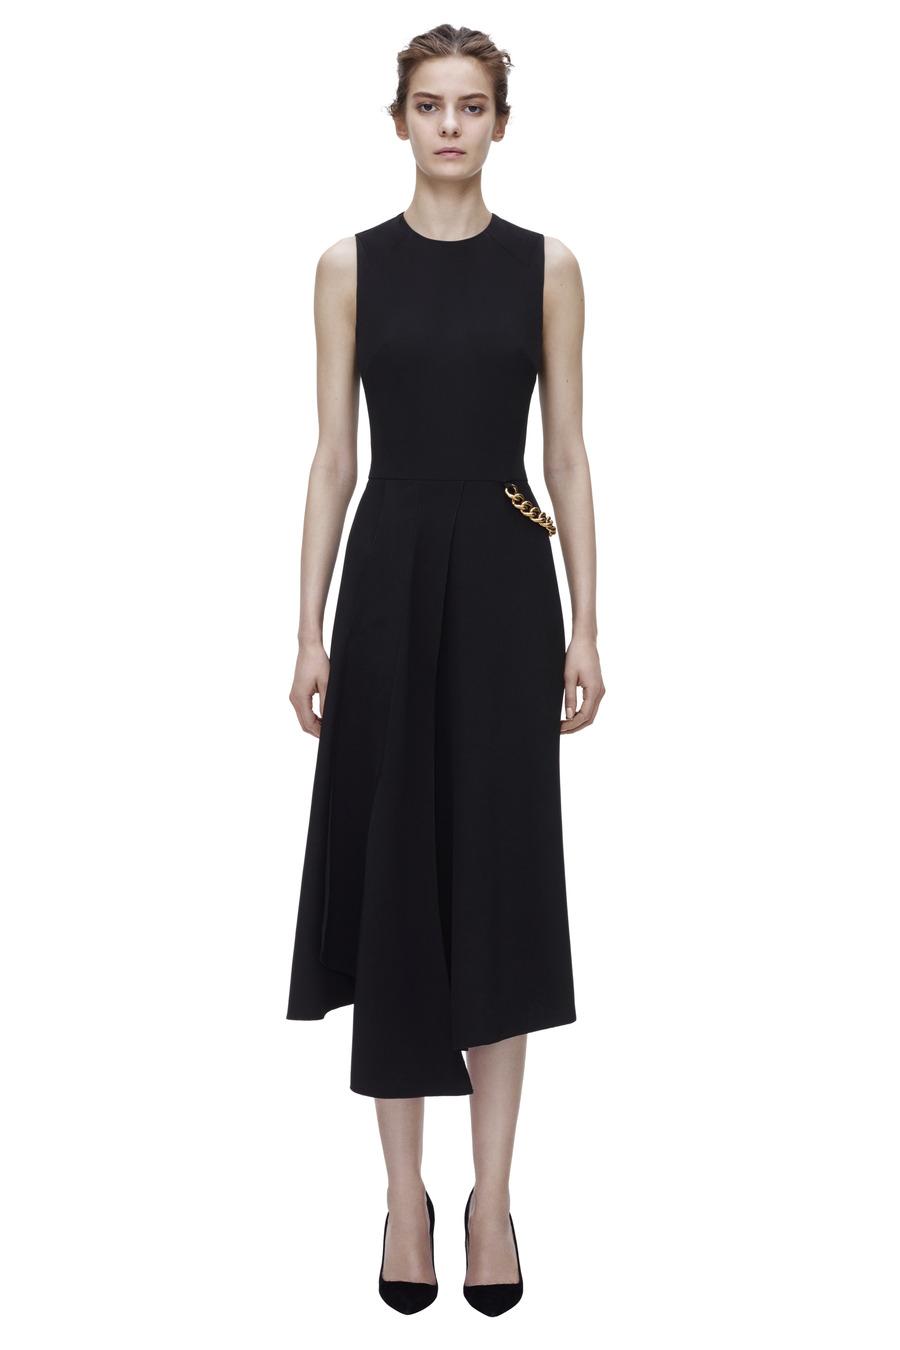 vicbeckham_dress